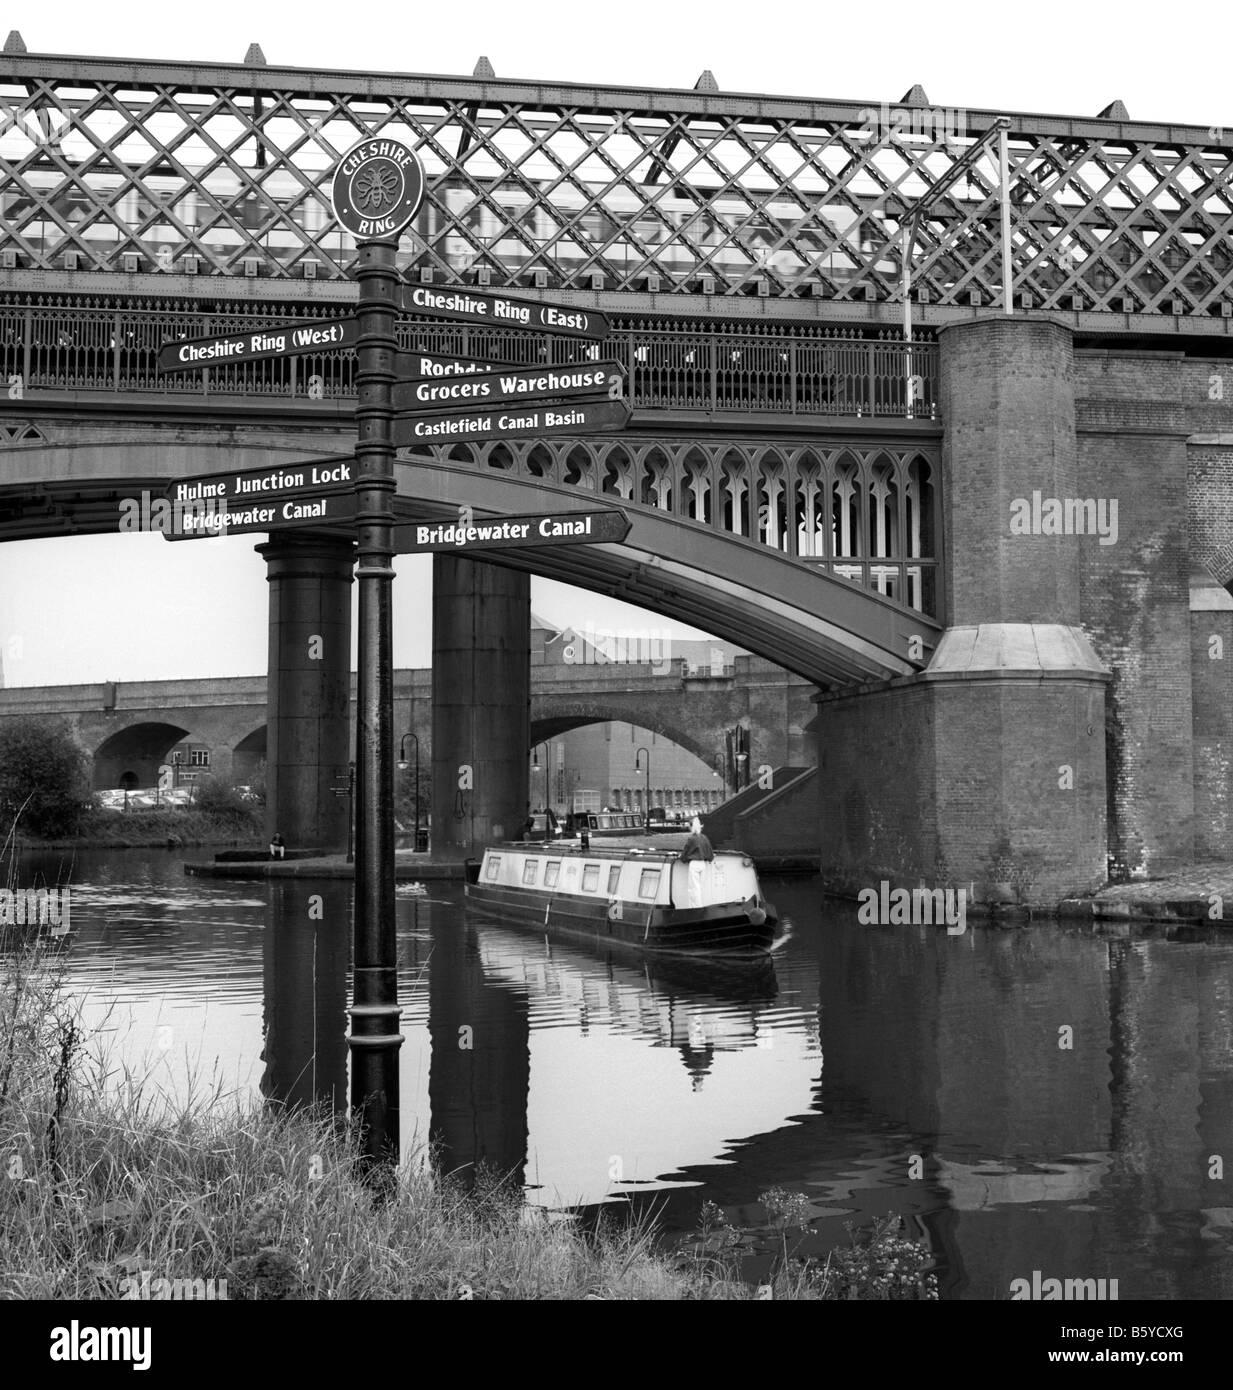 UK England Manchester Castlefield tourist information sign beside Bridgewater Canal - Stock Image